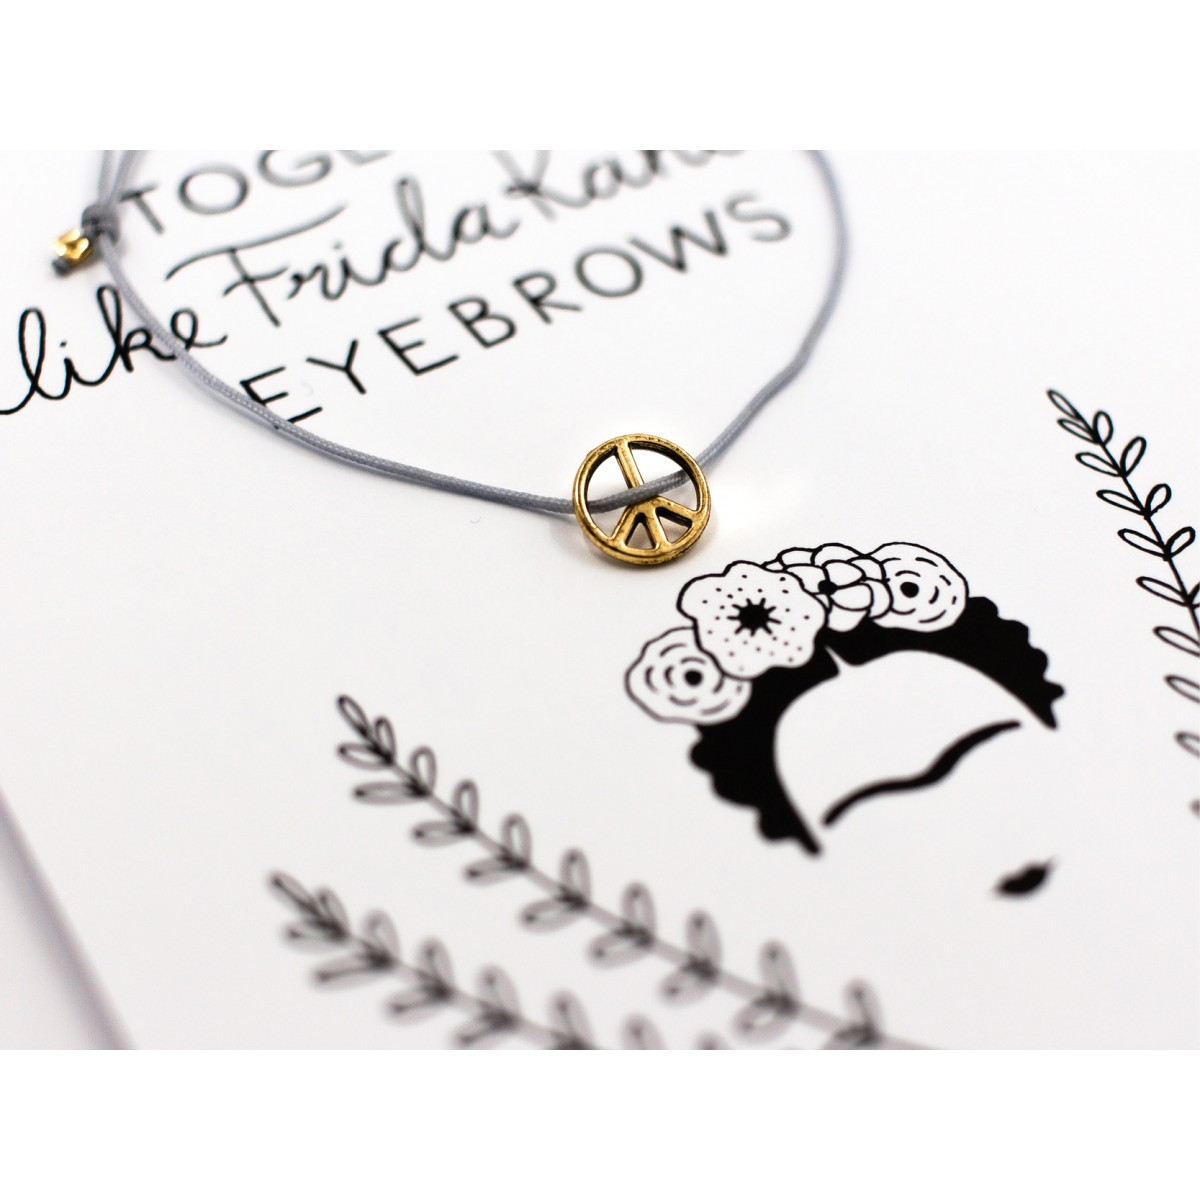 typealive / Armband / Fridas Eyebrows